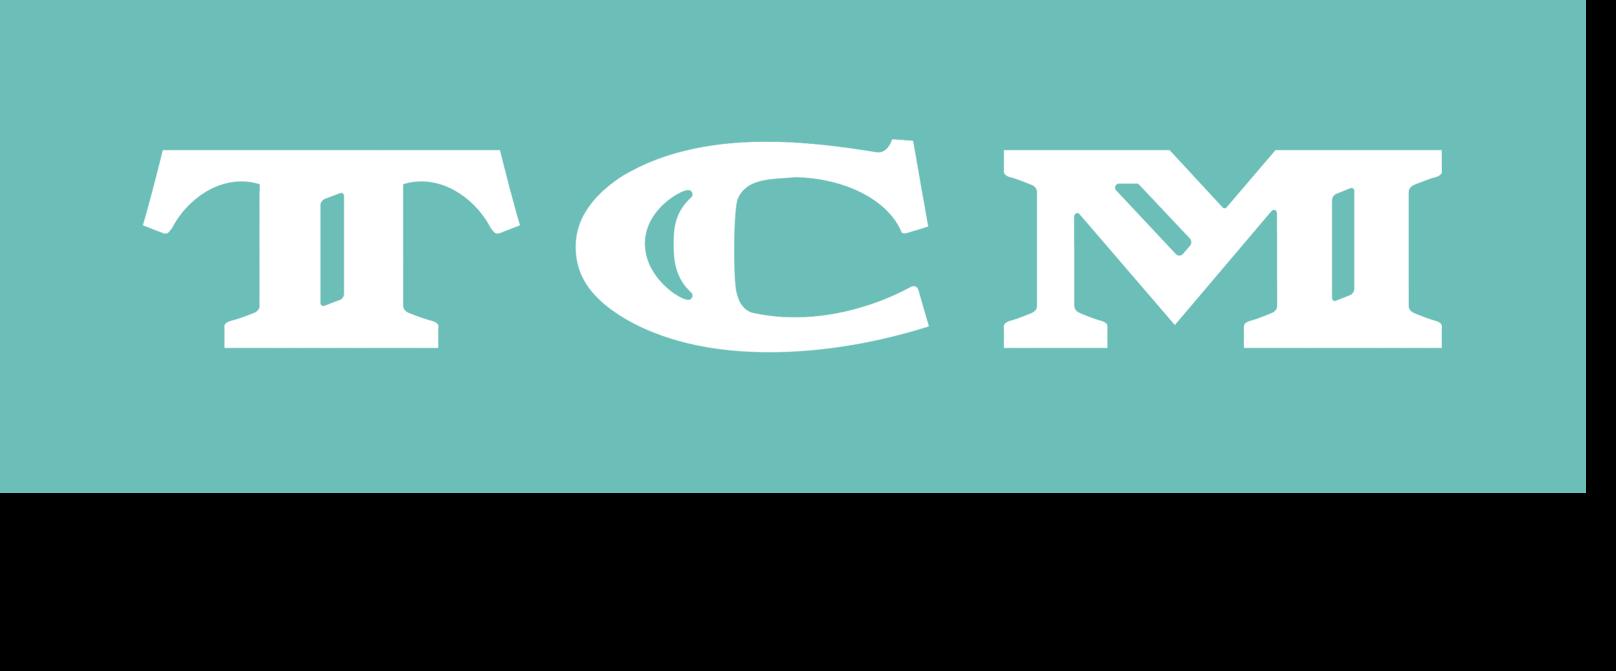 Image turner classic movies logo 2013 with the tm symbolg turner classic movies logo 2013 with the tm symbolg buycottarizona